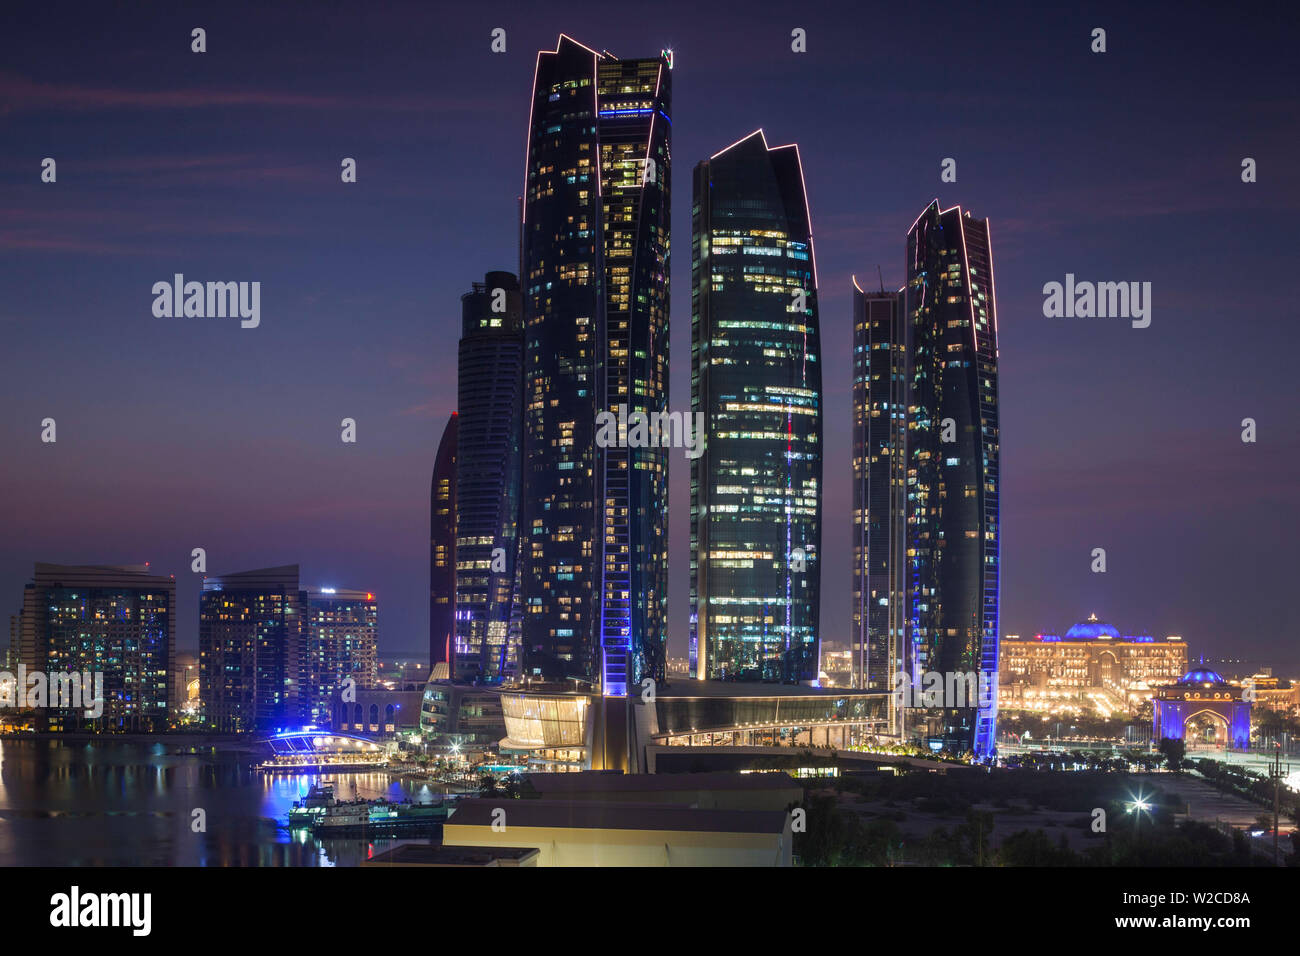 UAE, Abu Dhabi, Etihad Towers, dusk - Stock Image